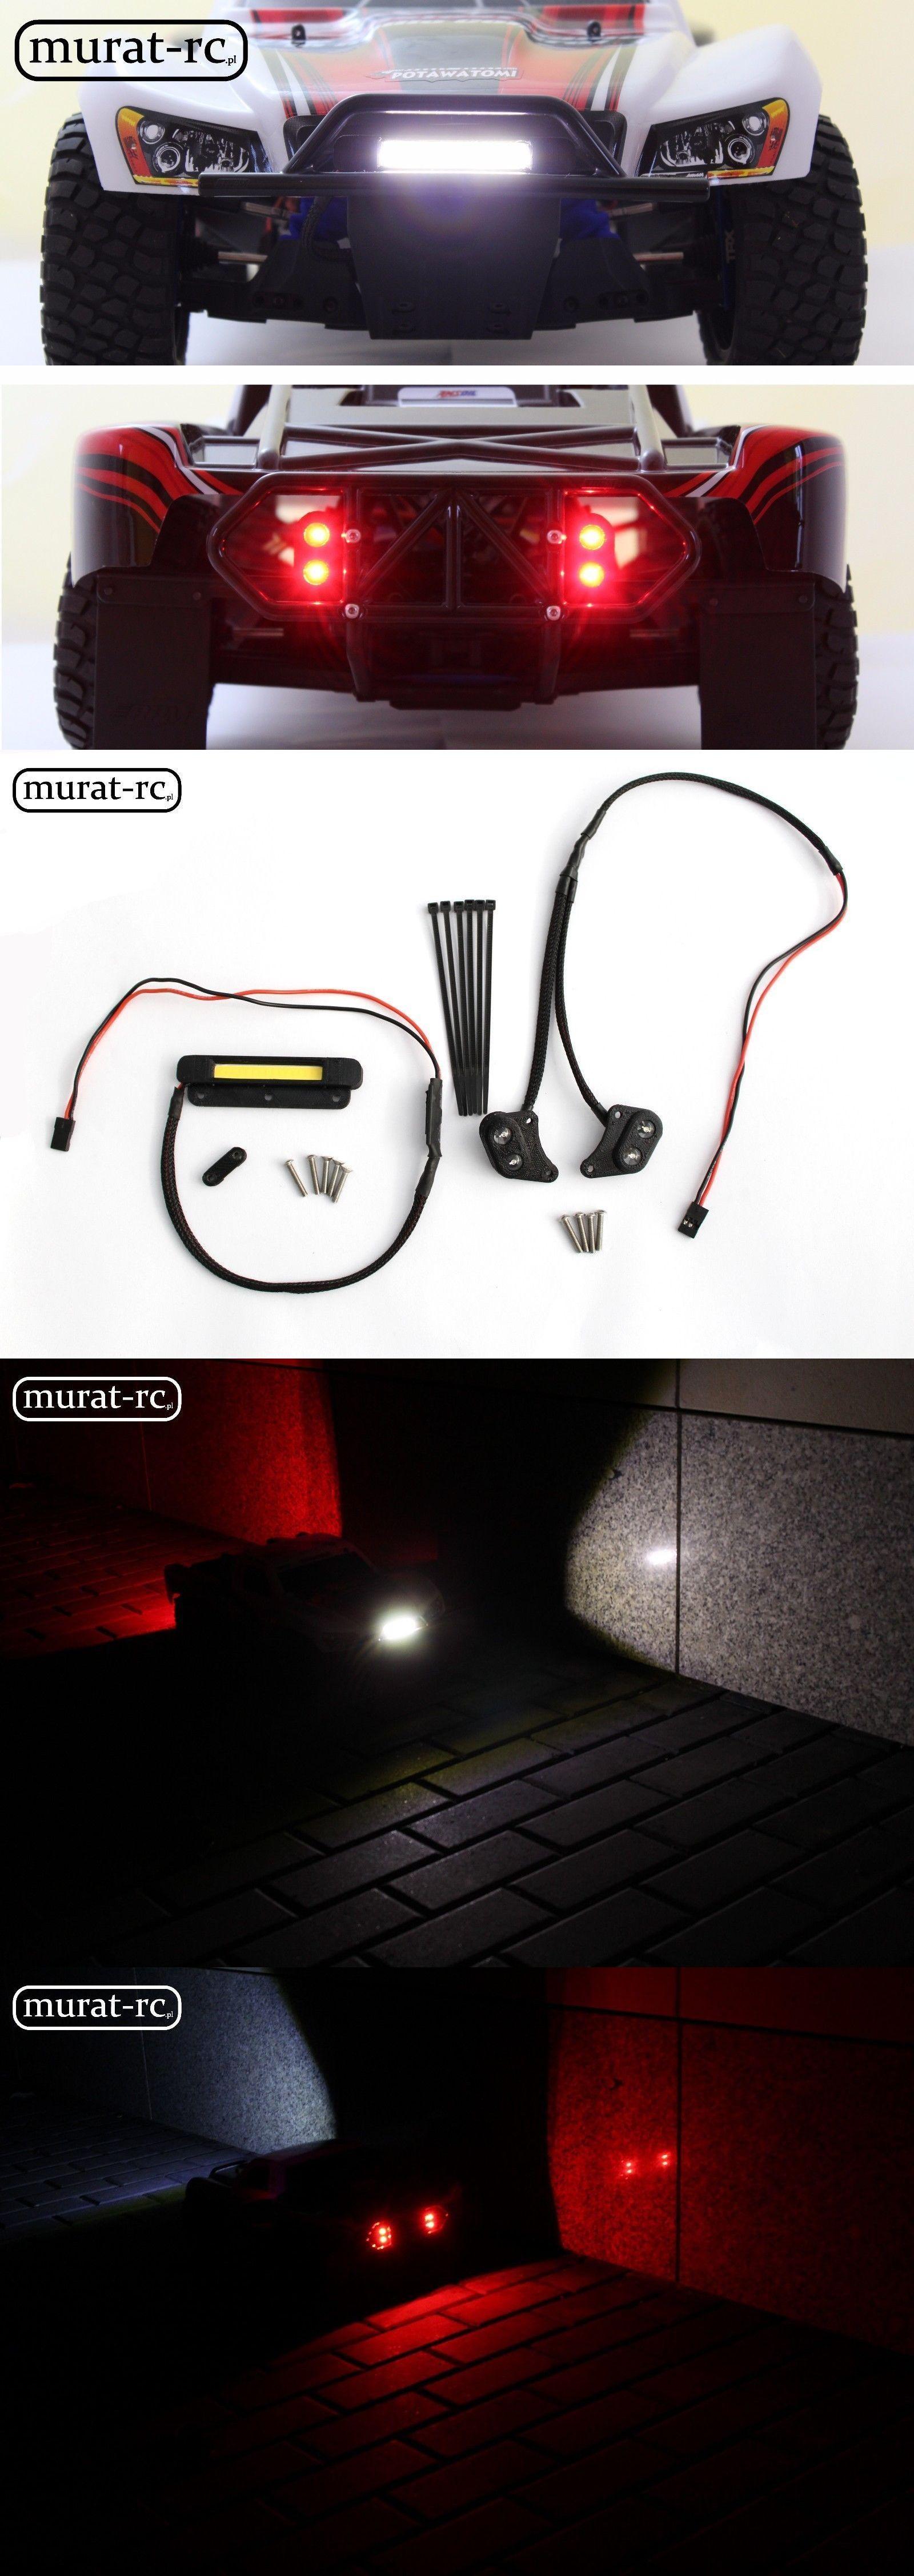 LED Light For RPM Bumper Traxxas Slash 1//10 4x4 2WD waterproof by murat-rc